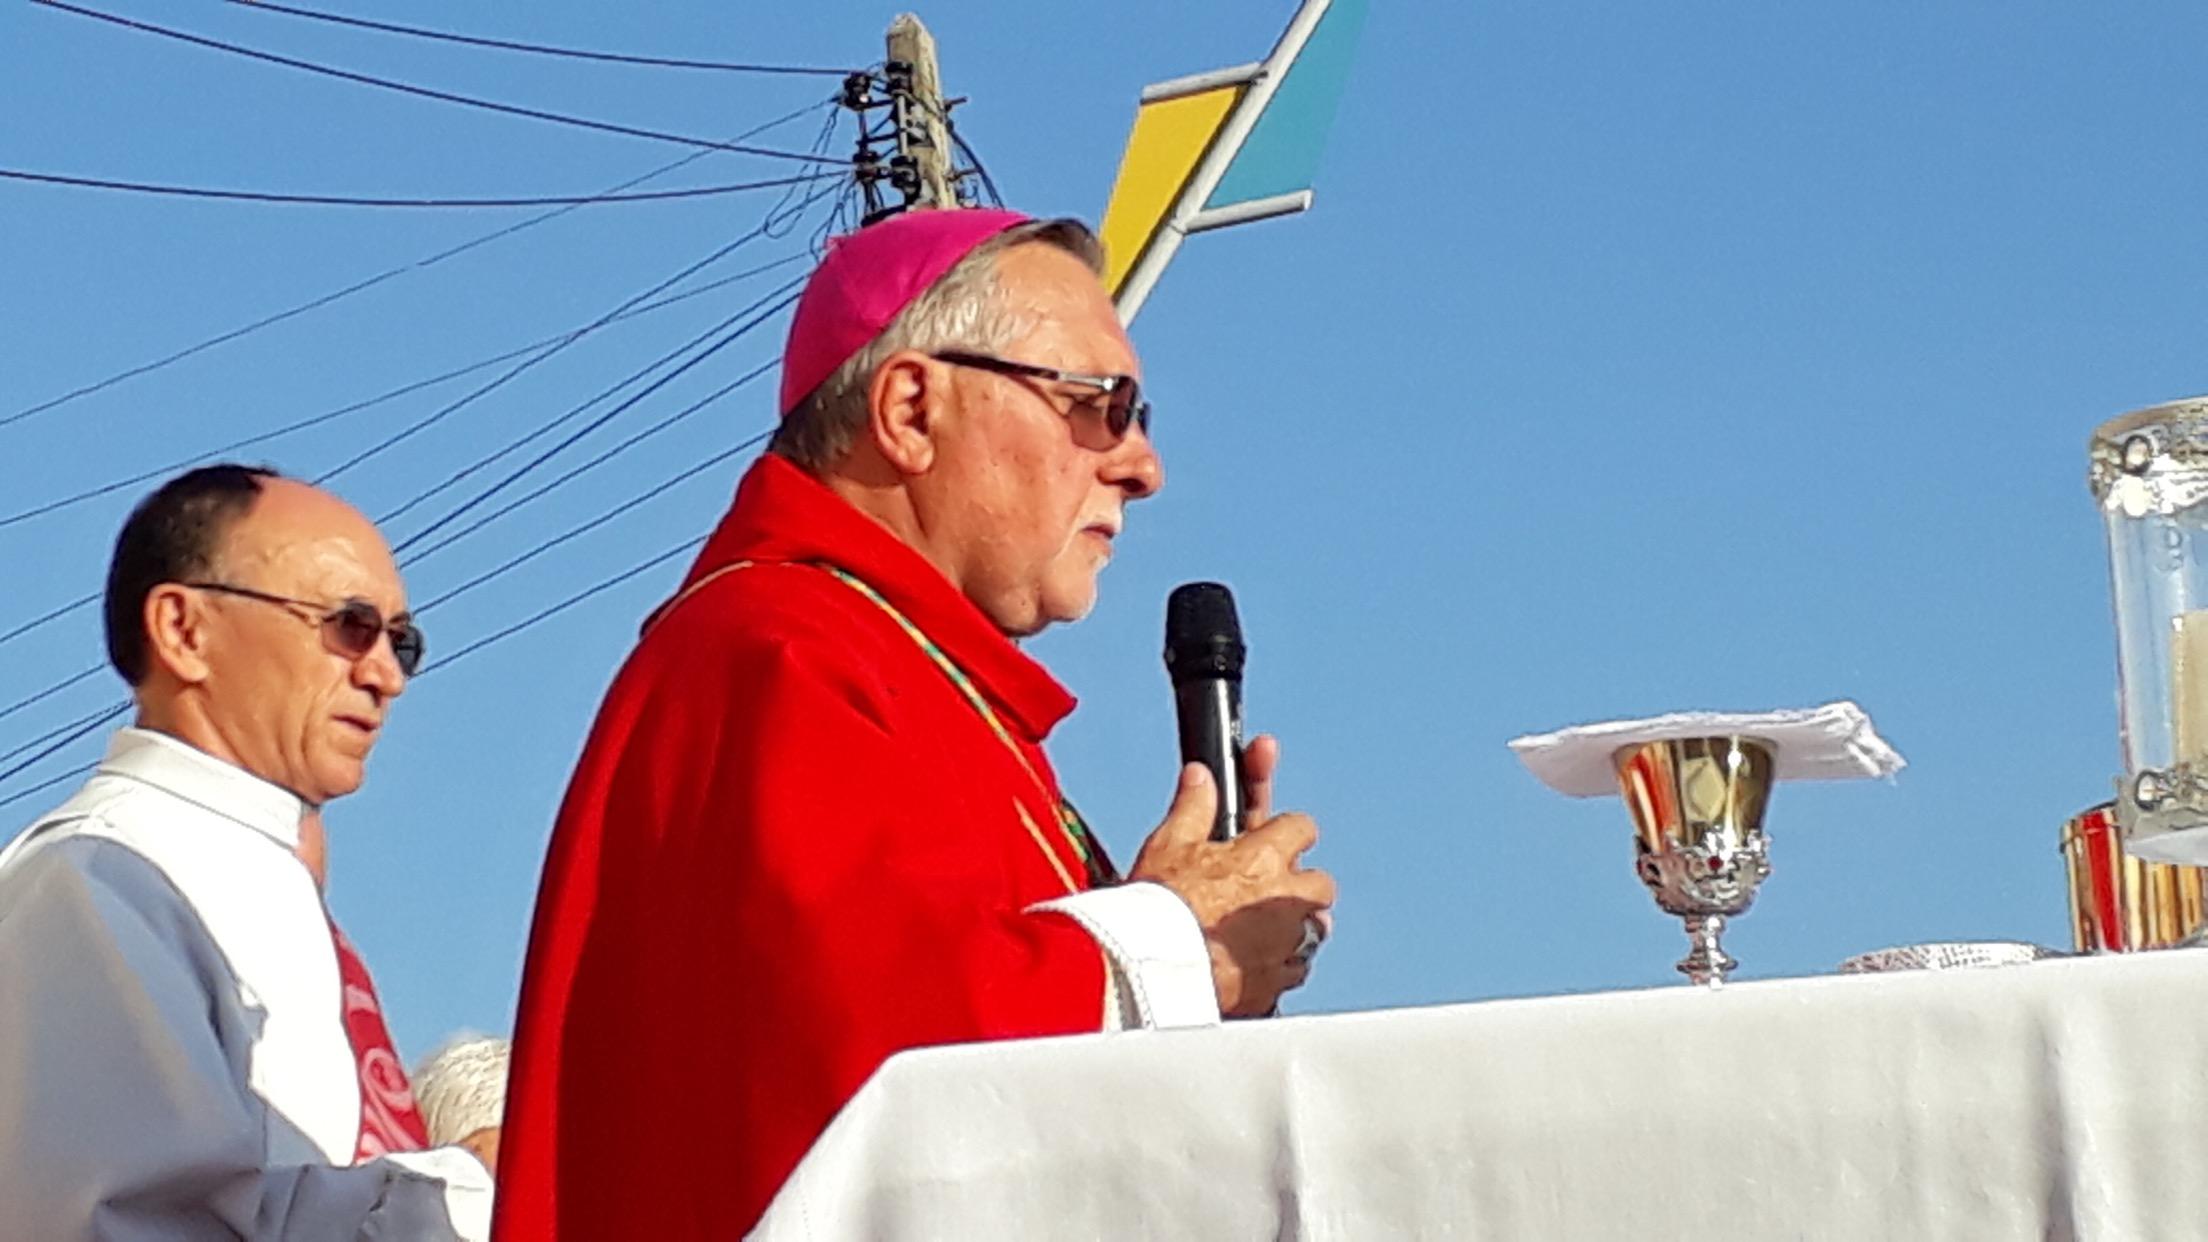 Missa do Padre Cícero foi presidida pelo Bispo de Quixadá